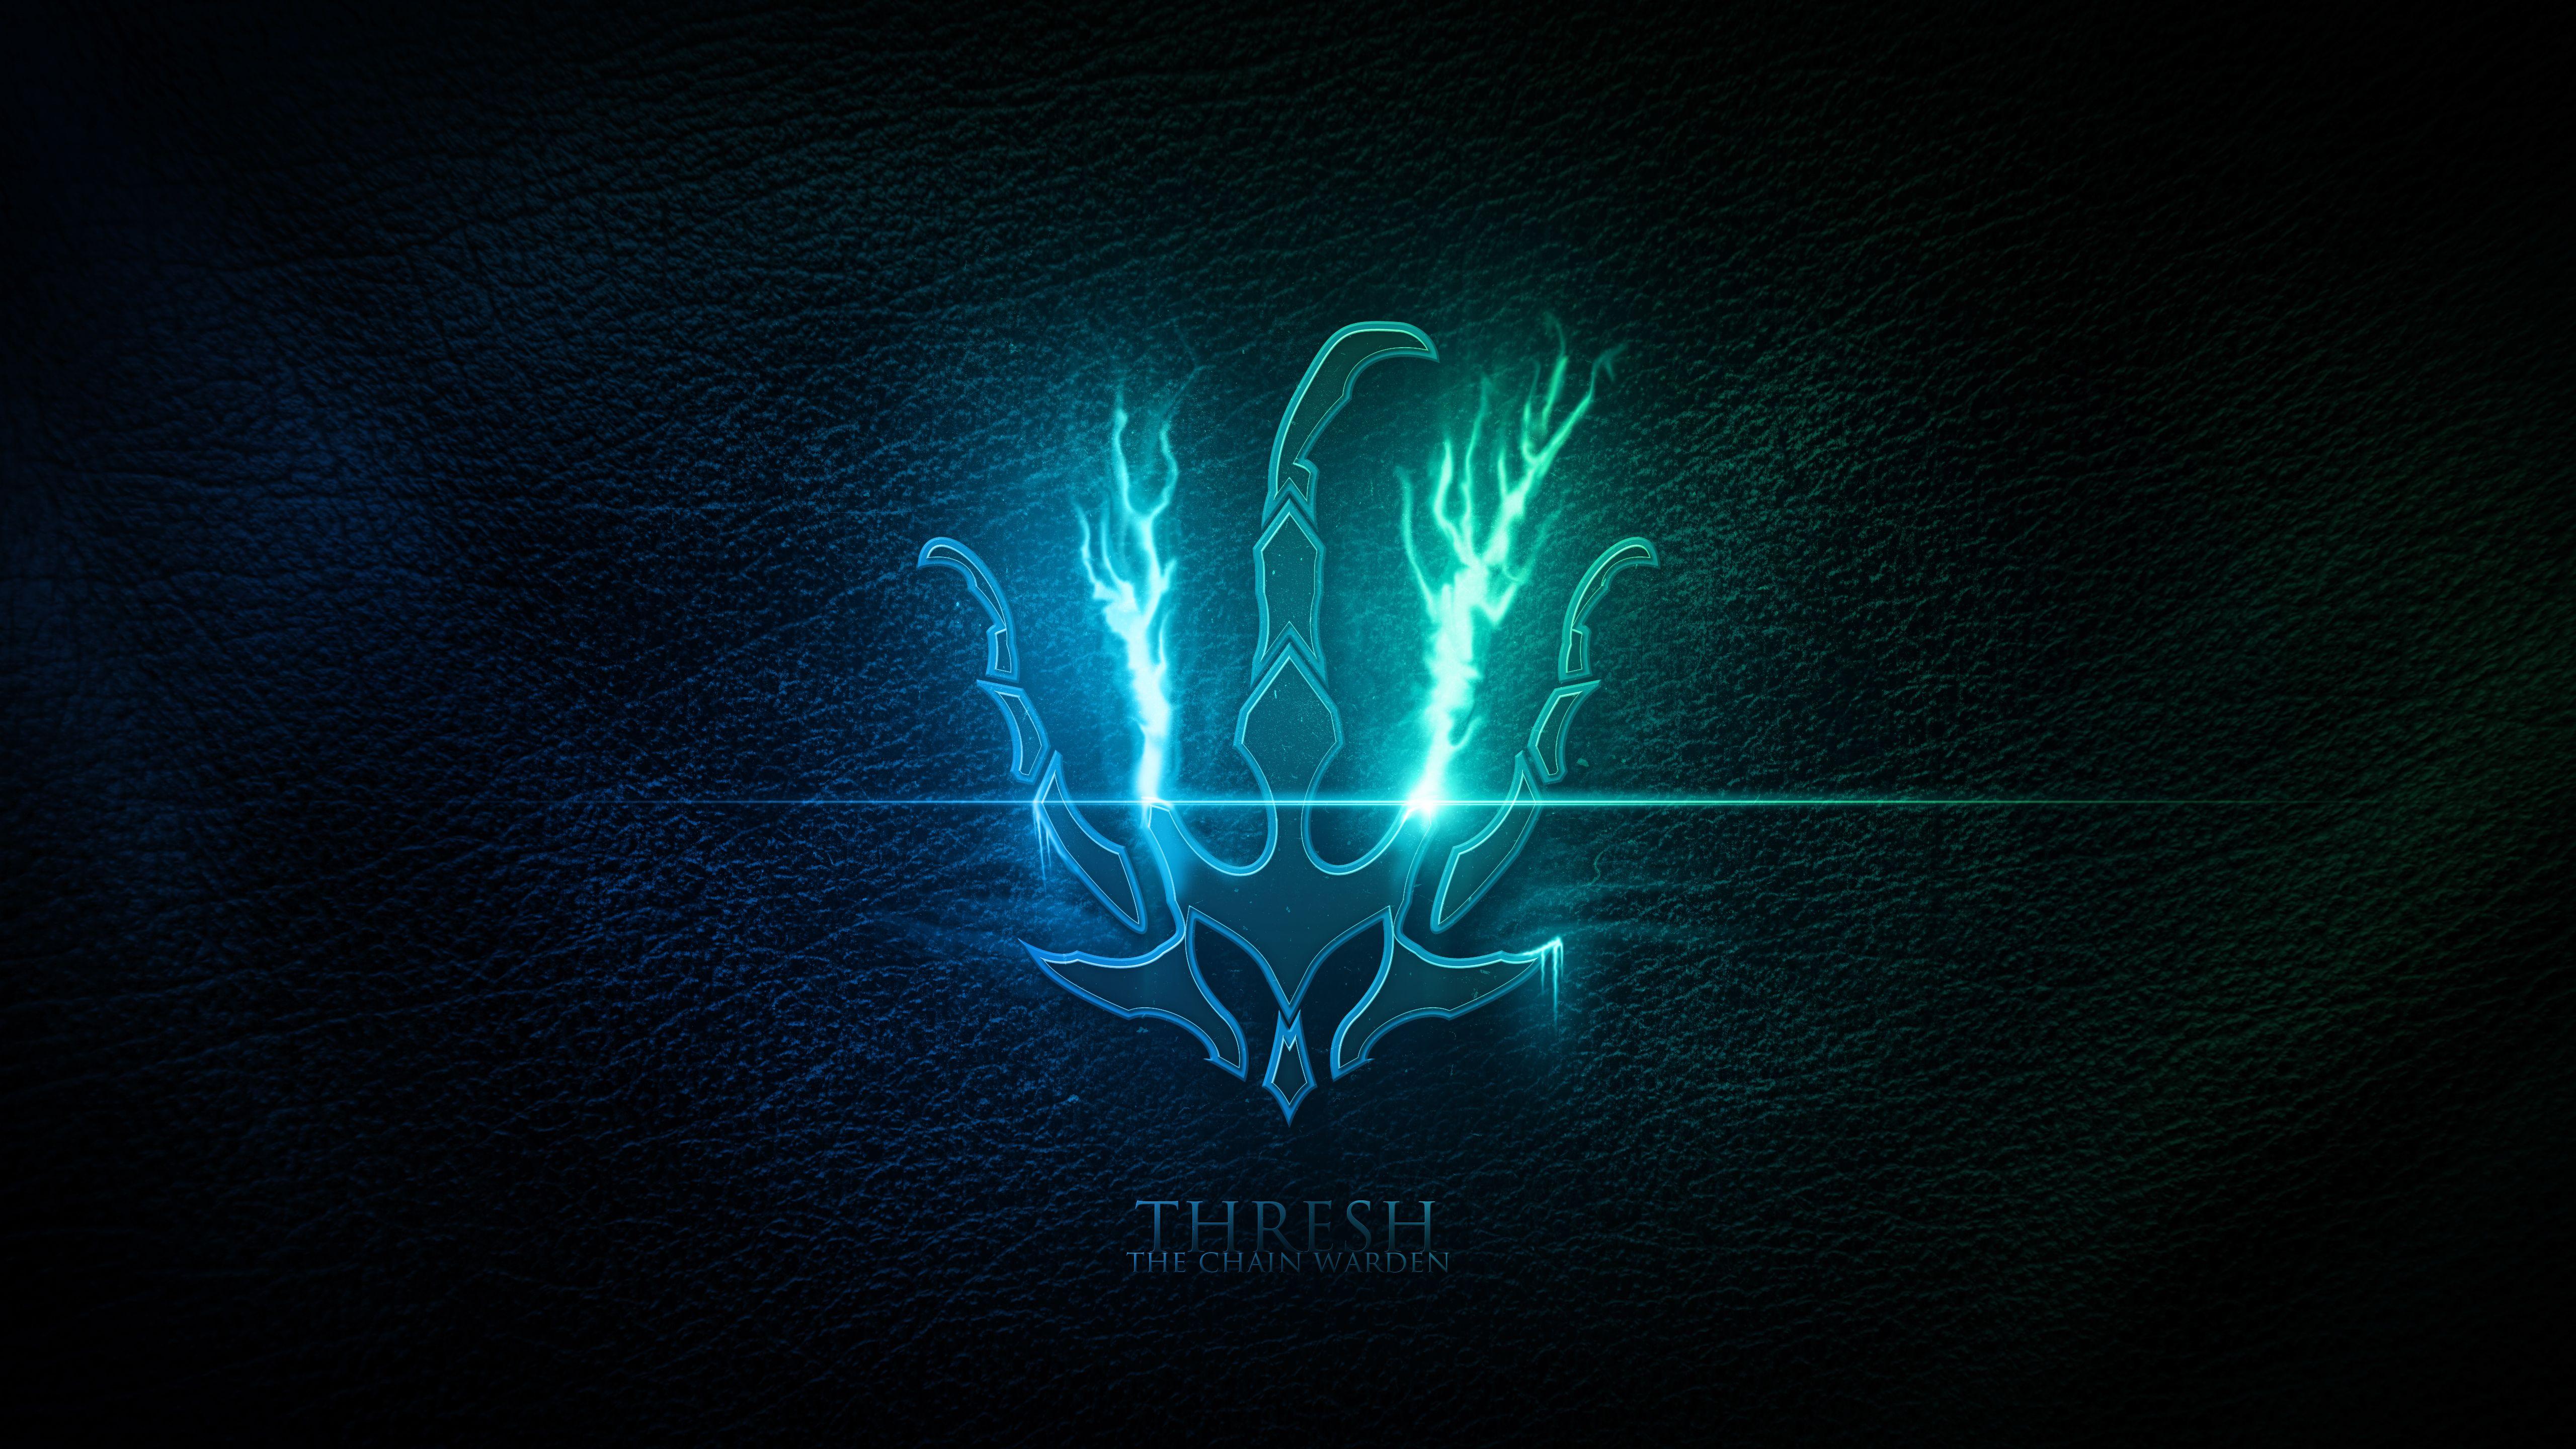 Thresh League Of Legends League Of Legends Game Lol League Of